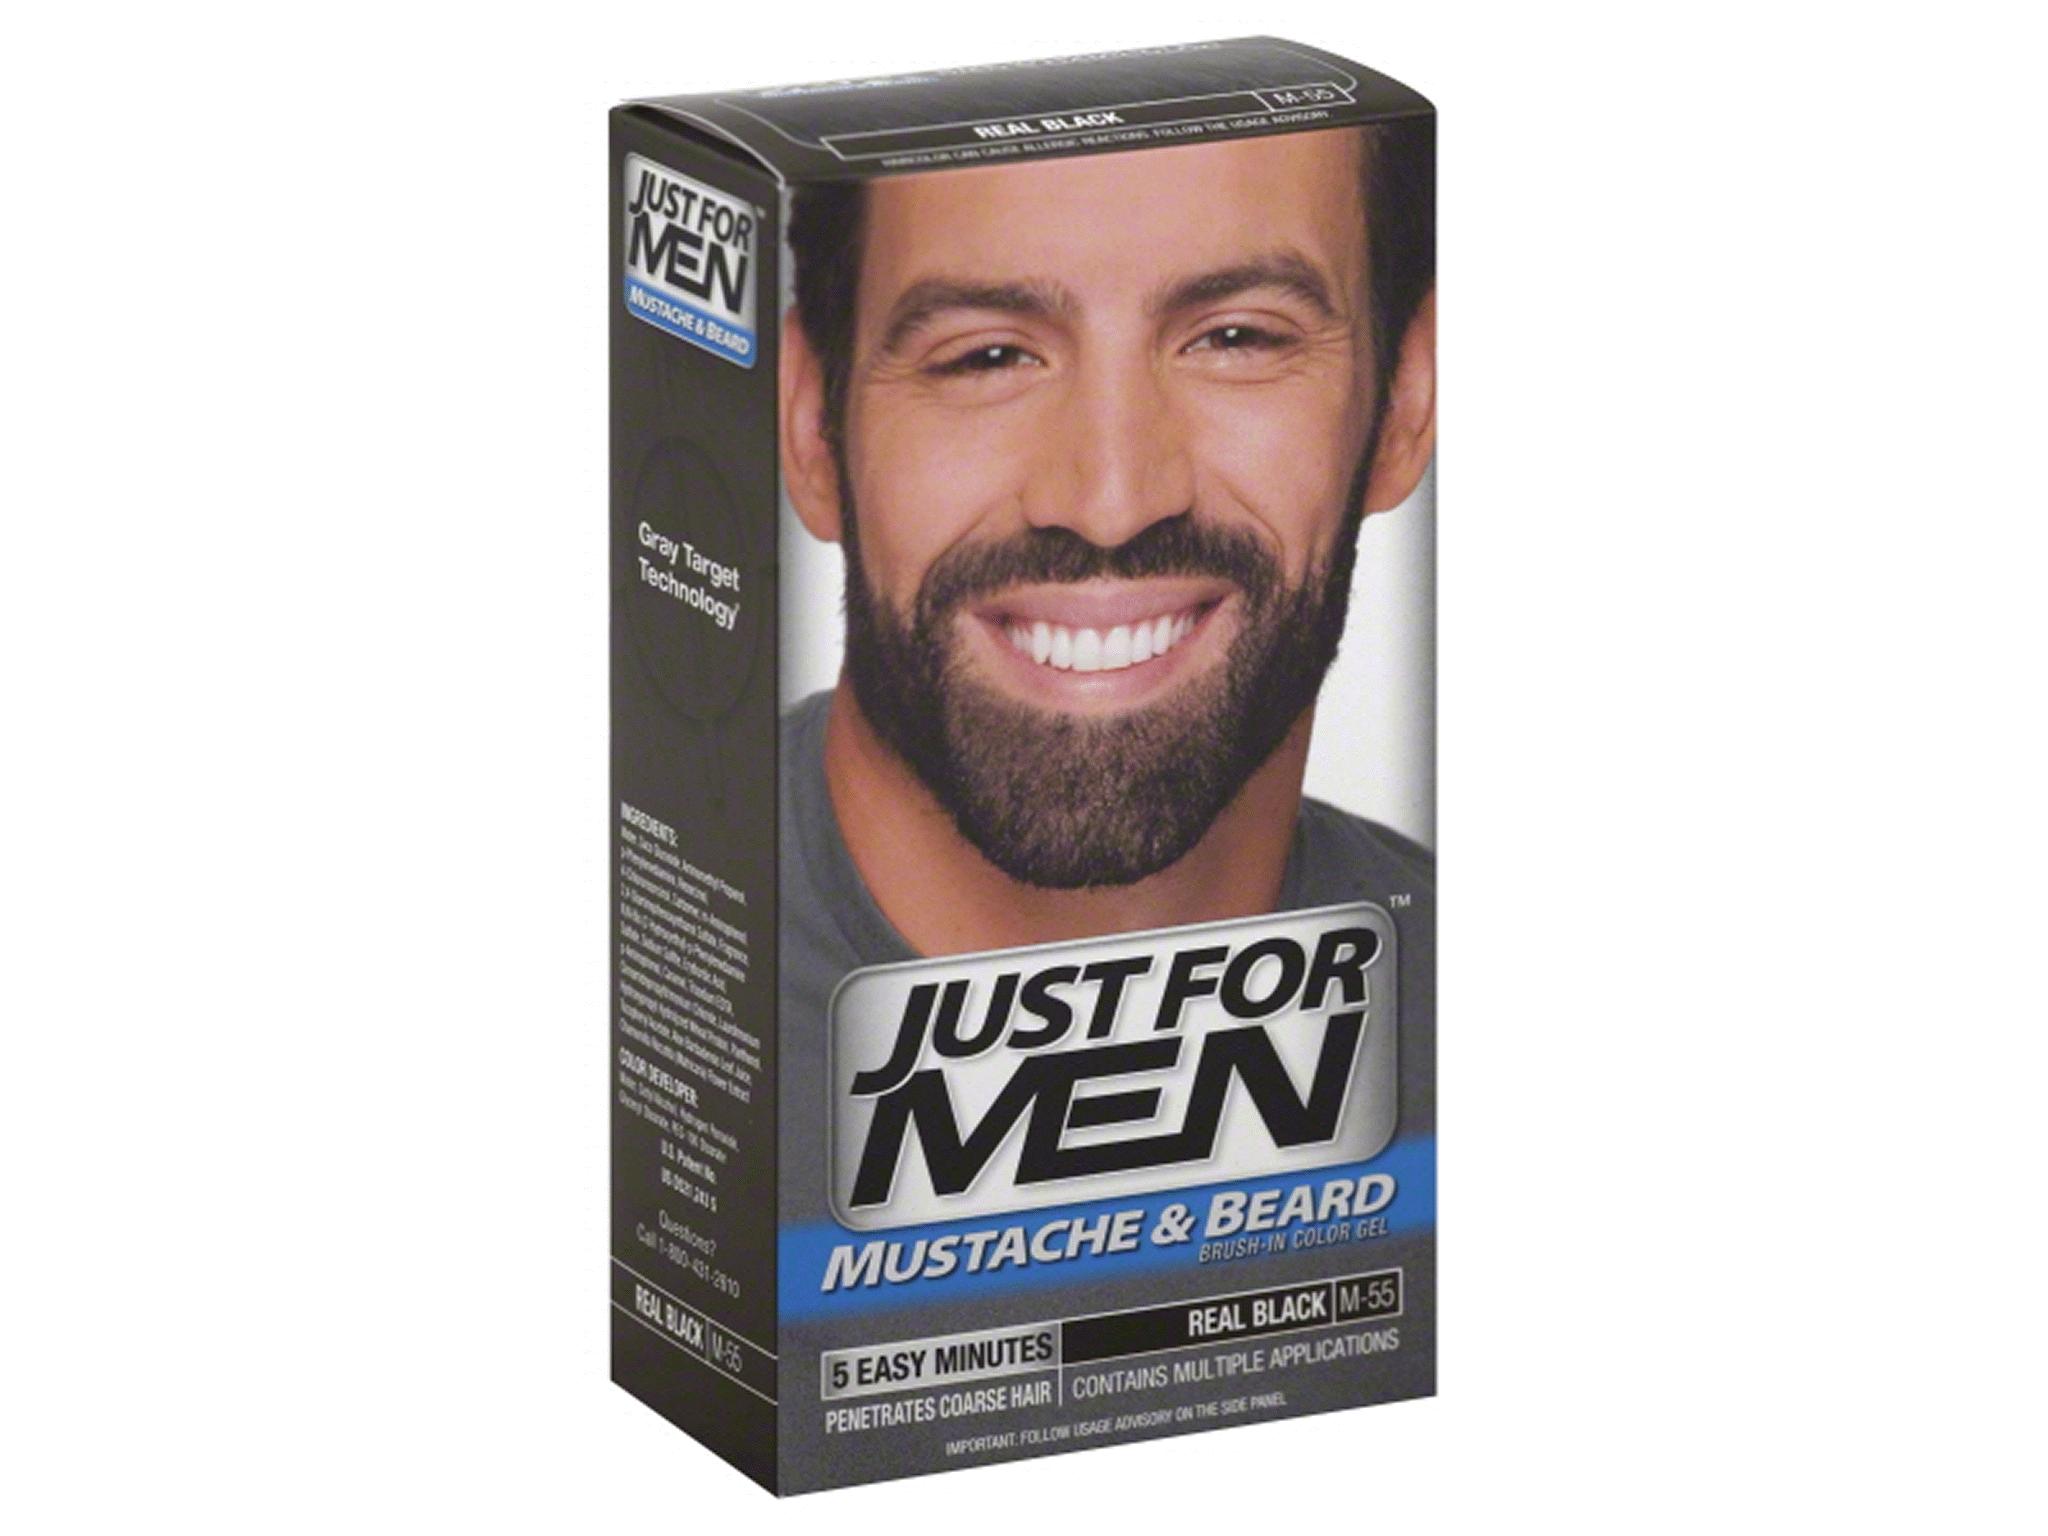 Just For Men Mustache & Beard Real Black M-55 | Meijer.com